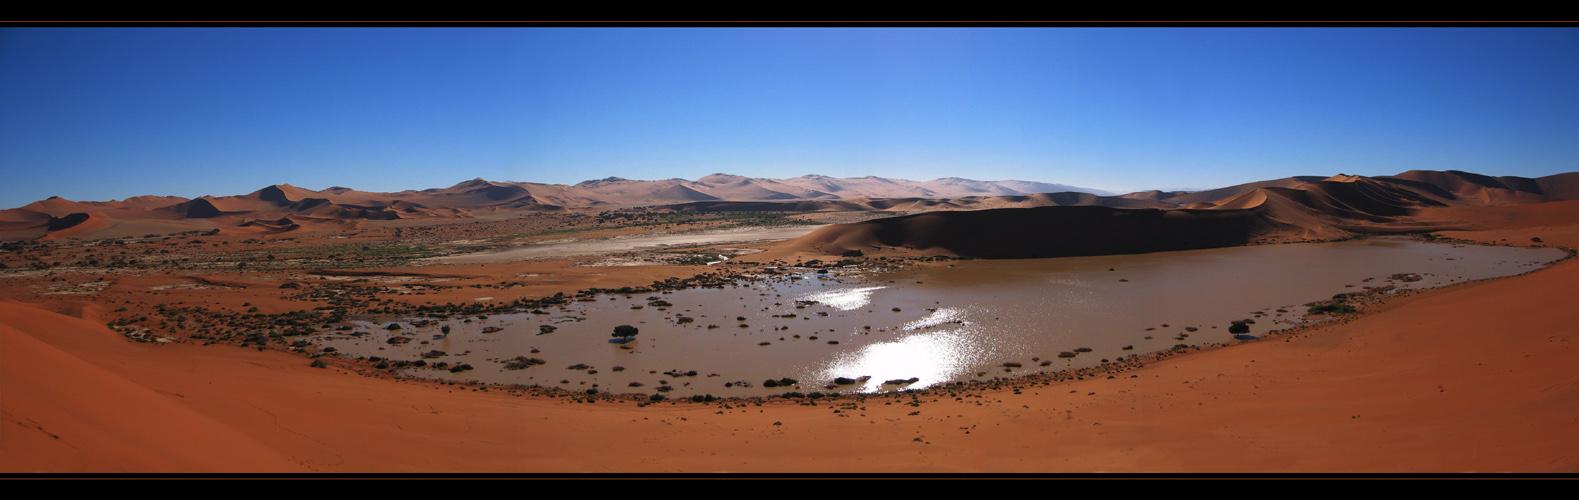 OASIS - Panorama